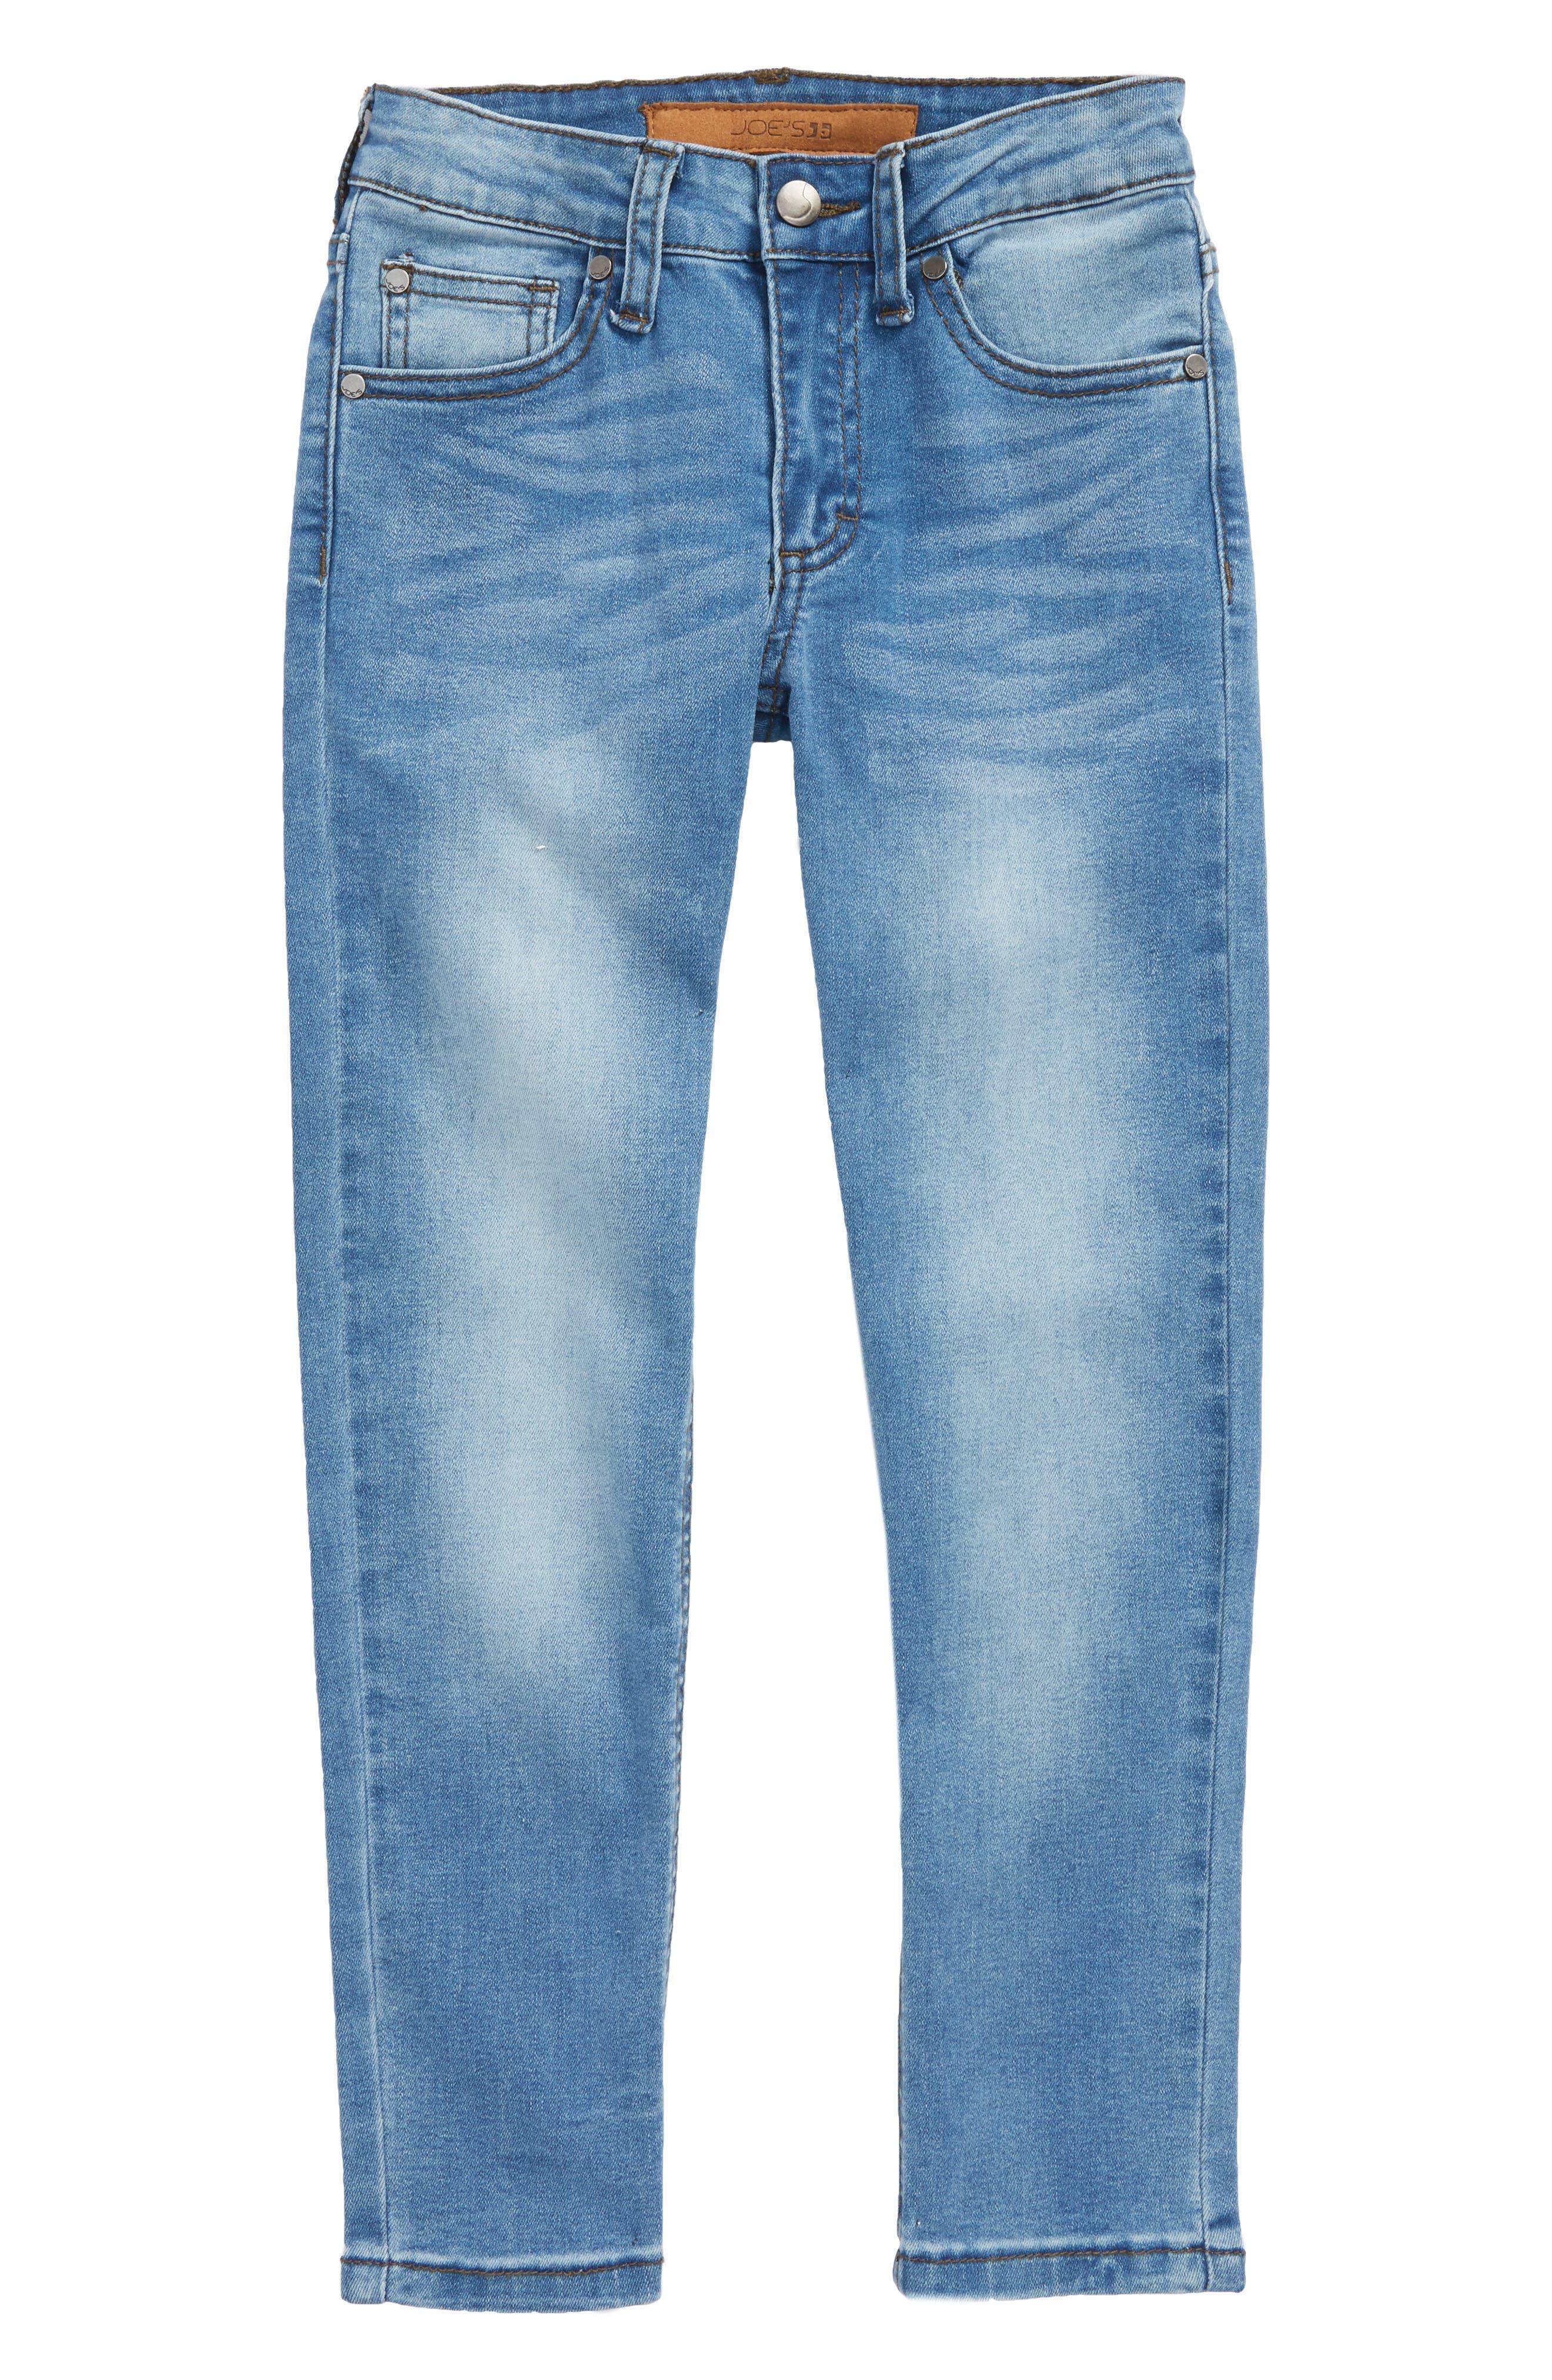 Alternate Image 1 Selected - Joe's Rad Slim Fit Stretch Jeans (Toddler Boys & Little Boys)